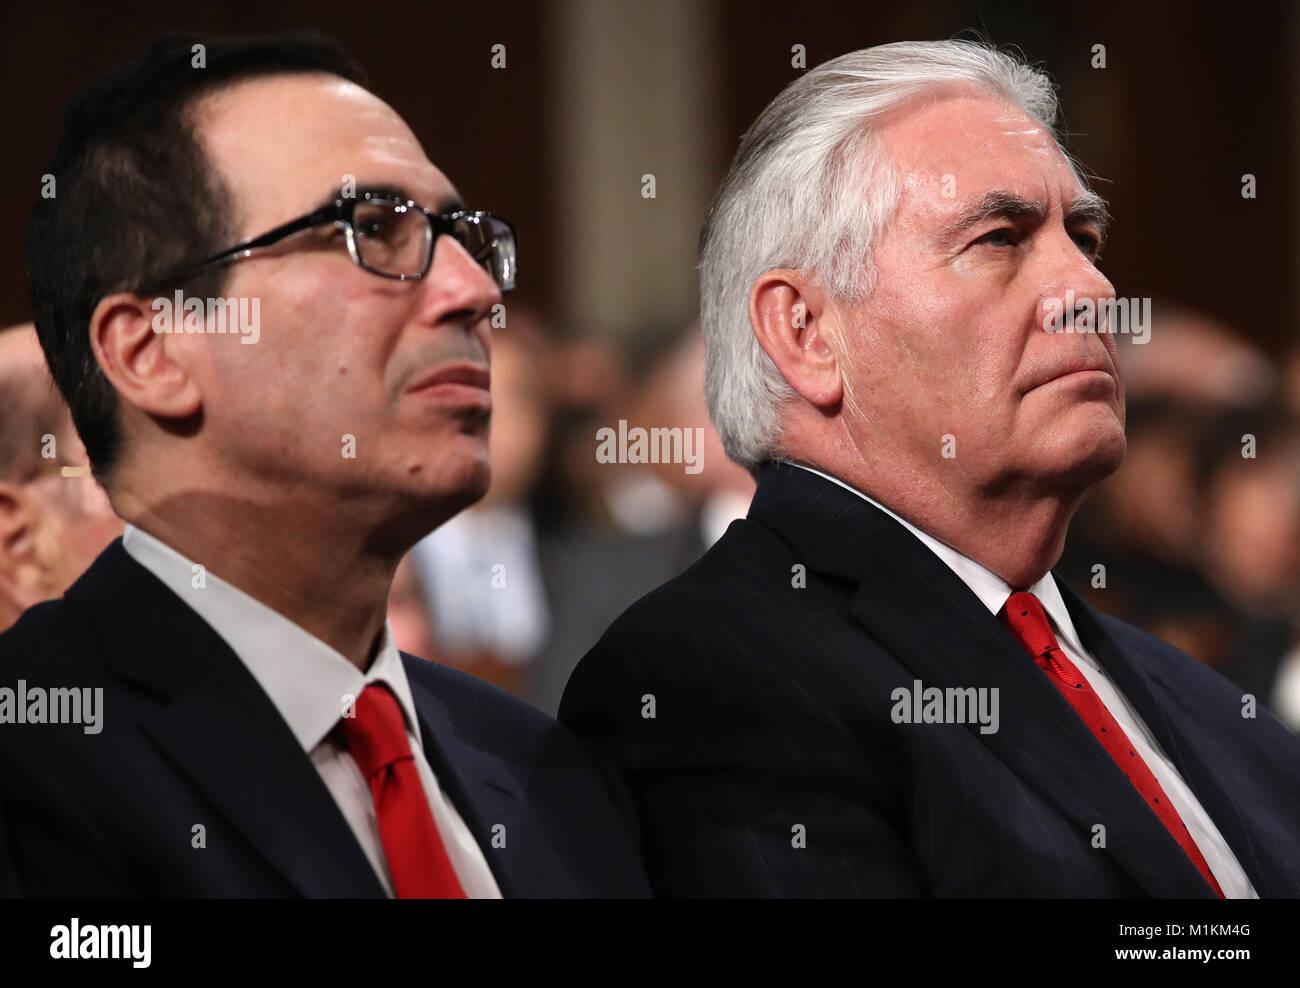 Washington, DC, USA. 30th Jan, 2018. Treasury Secretary Steven Mnuchin (L) and U.S. Secretary of State Rex Tillerson Stock Photo